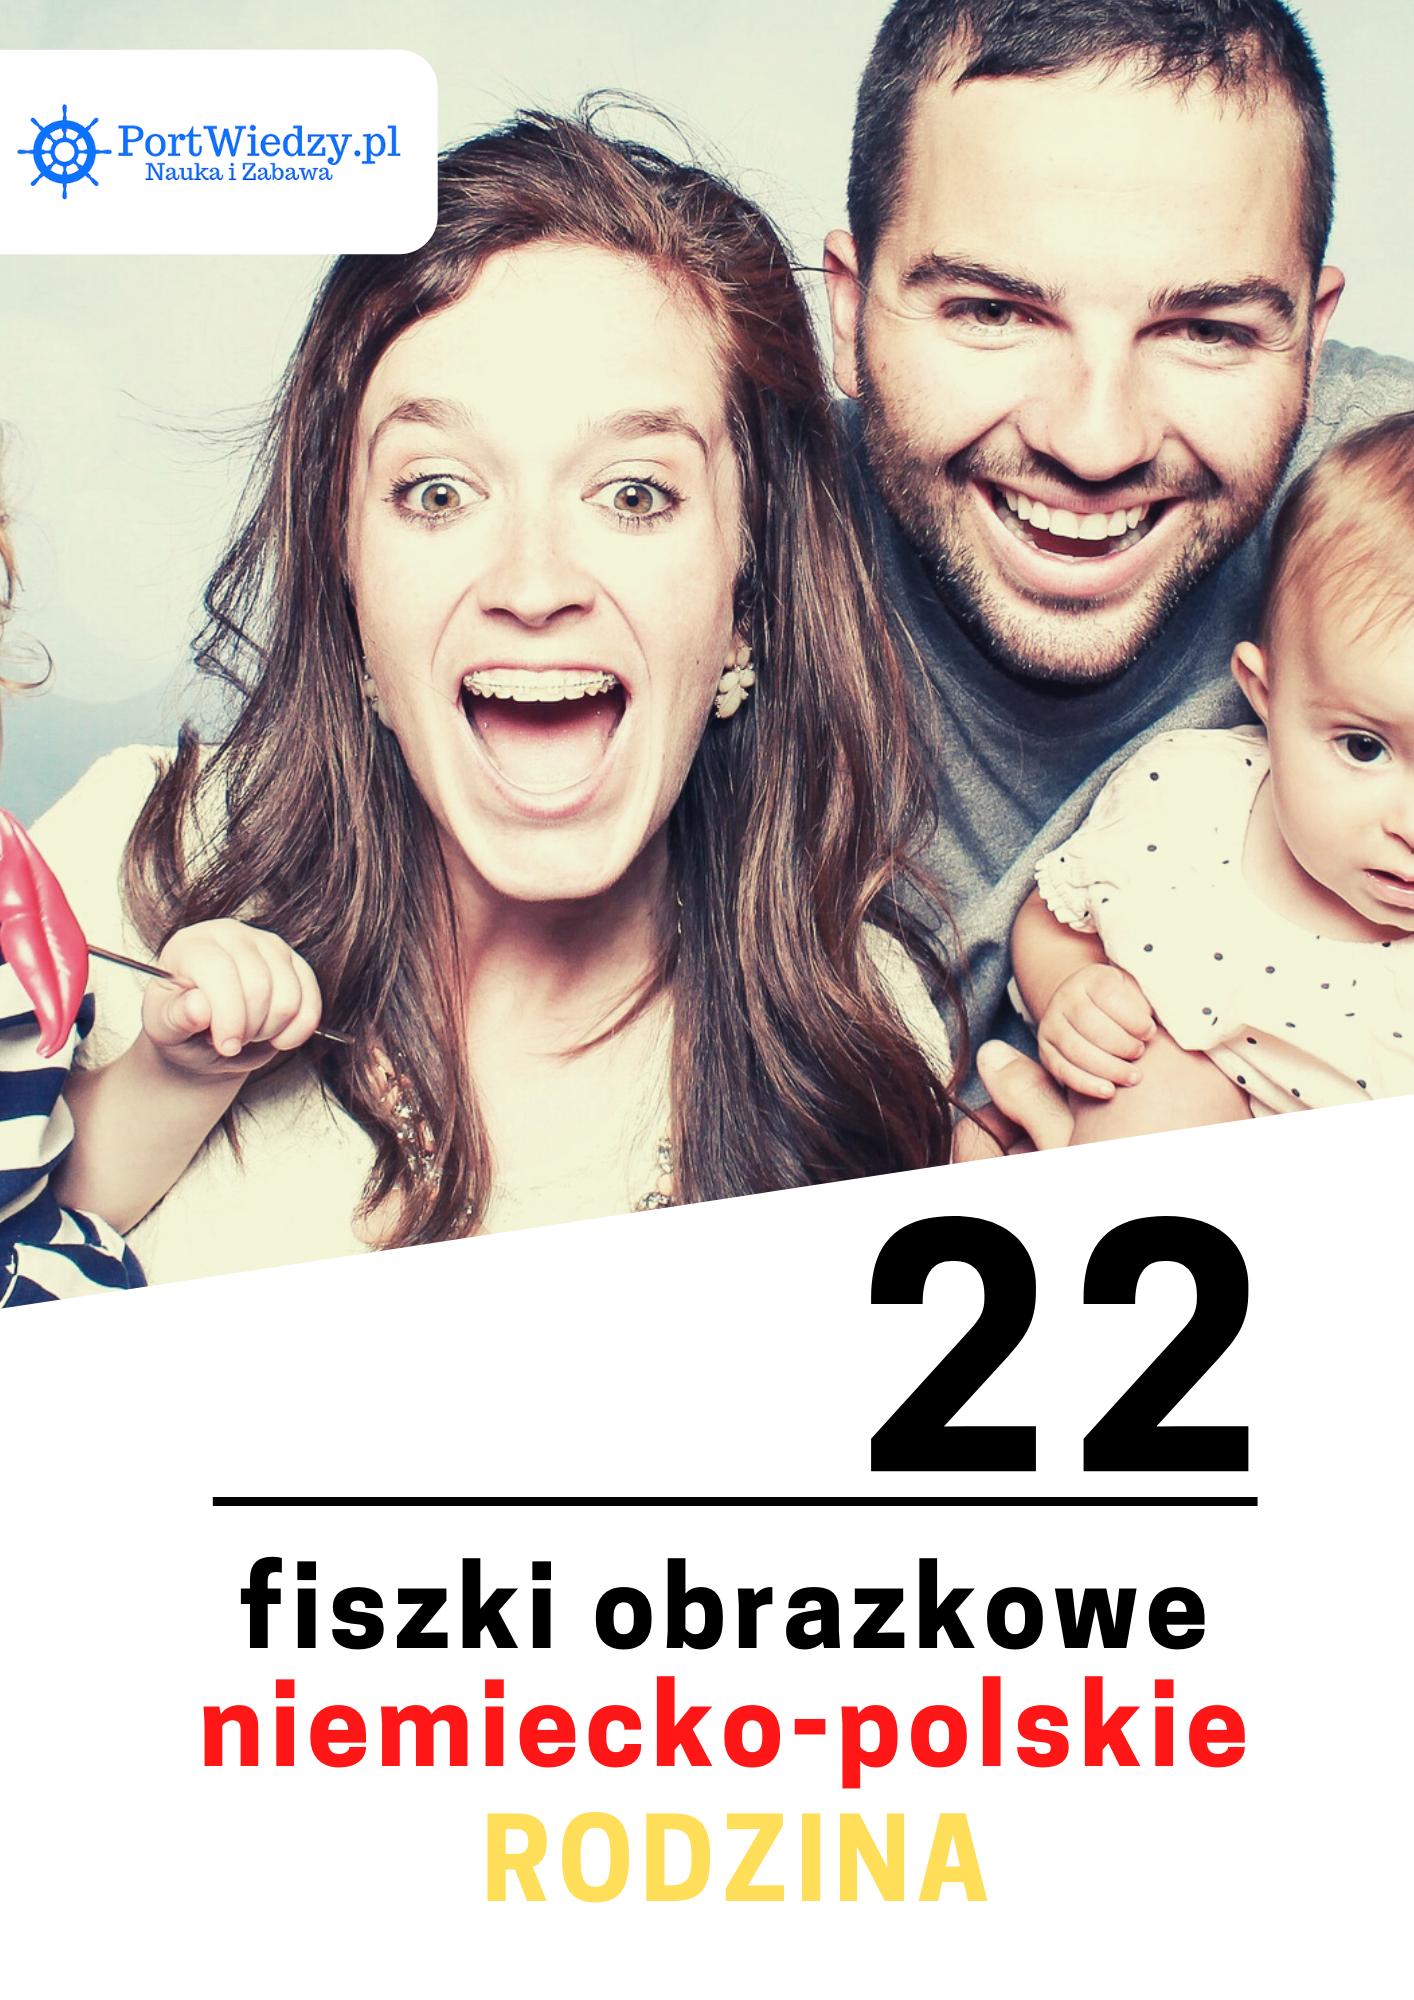 niemiecka rodzina fiszki - niemiecka_rodzina_fiszki